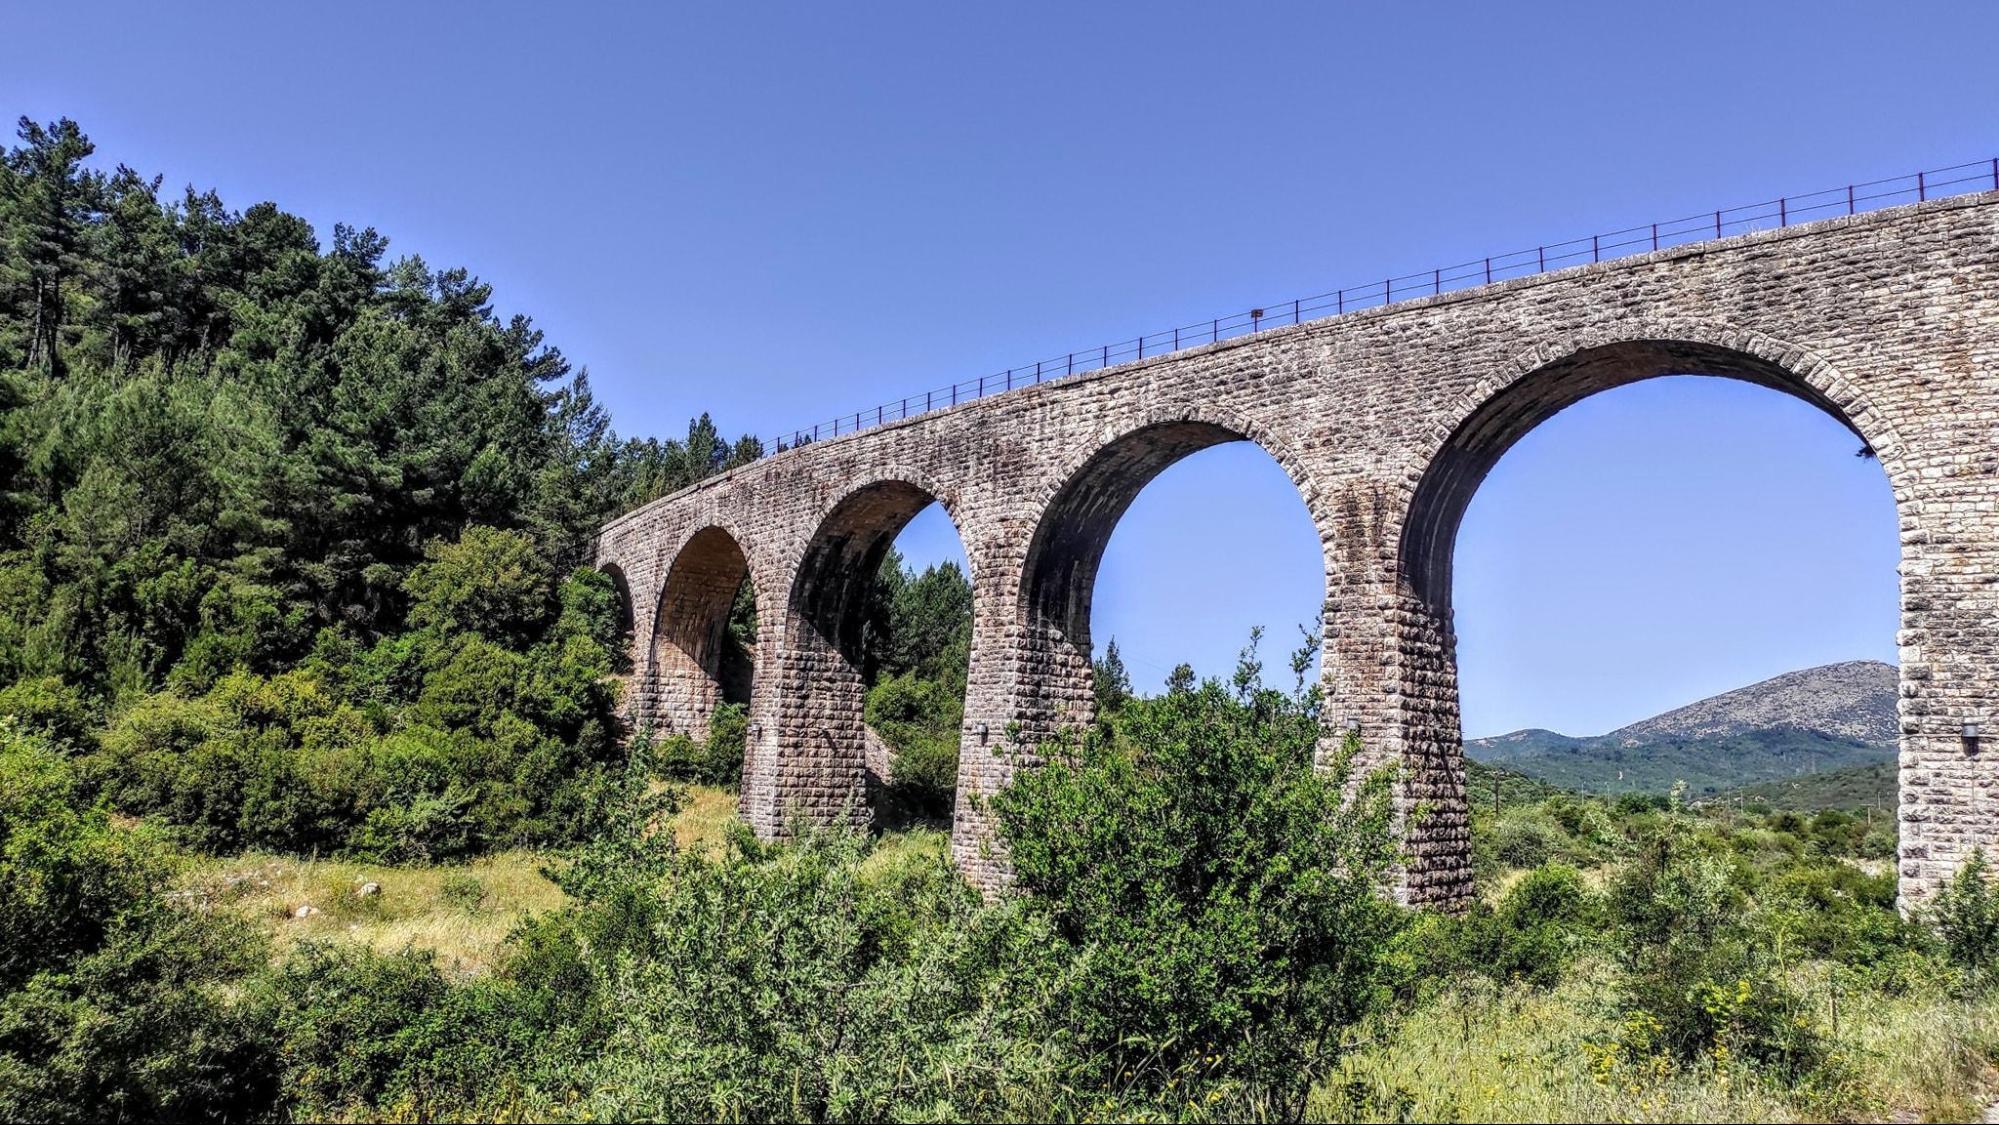 manari stone bridge image